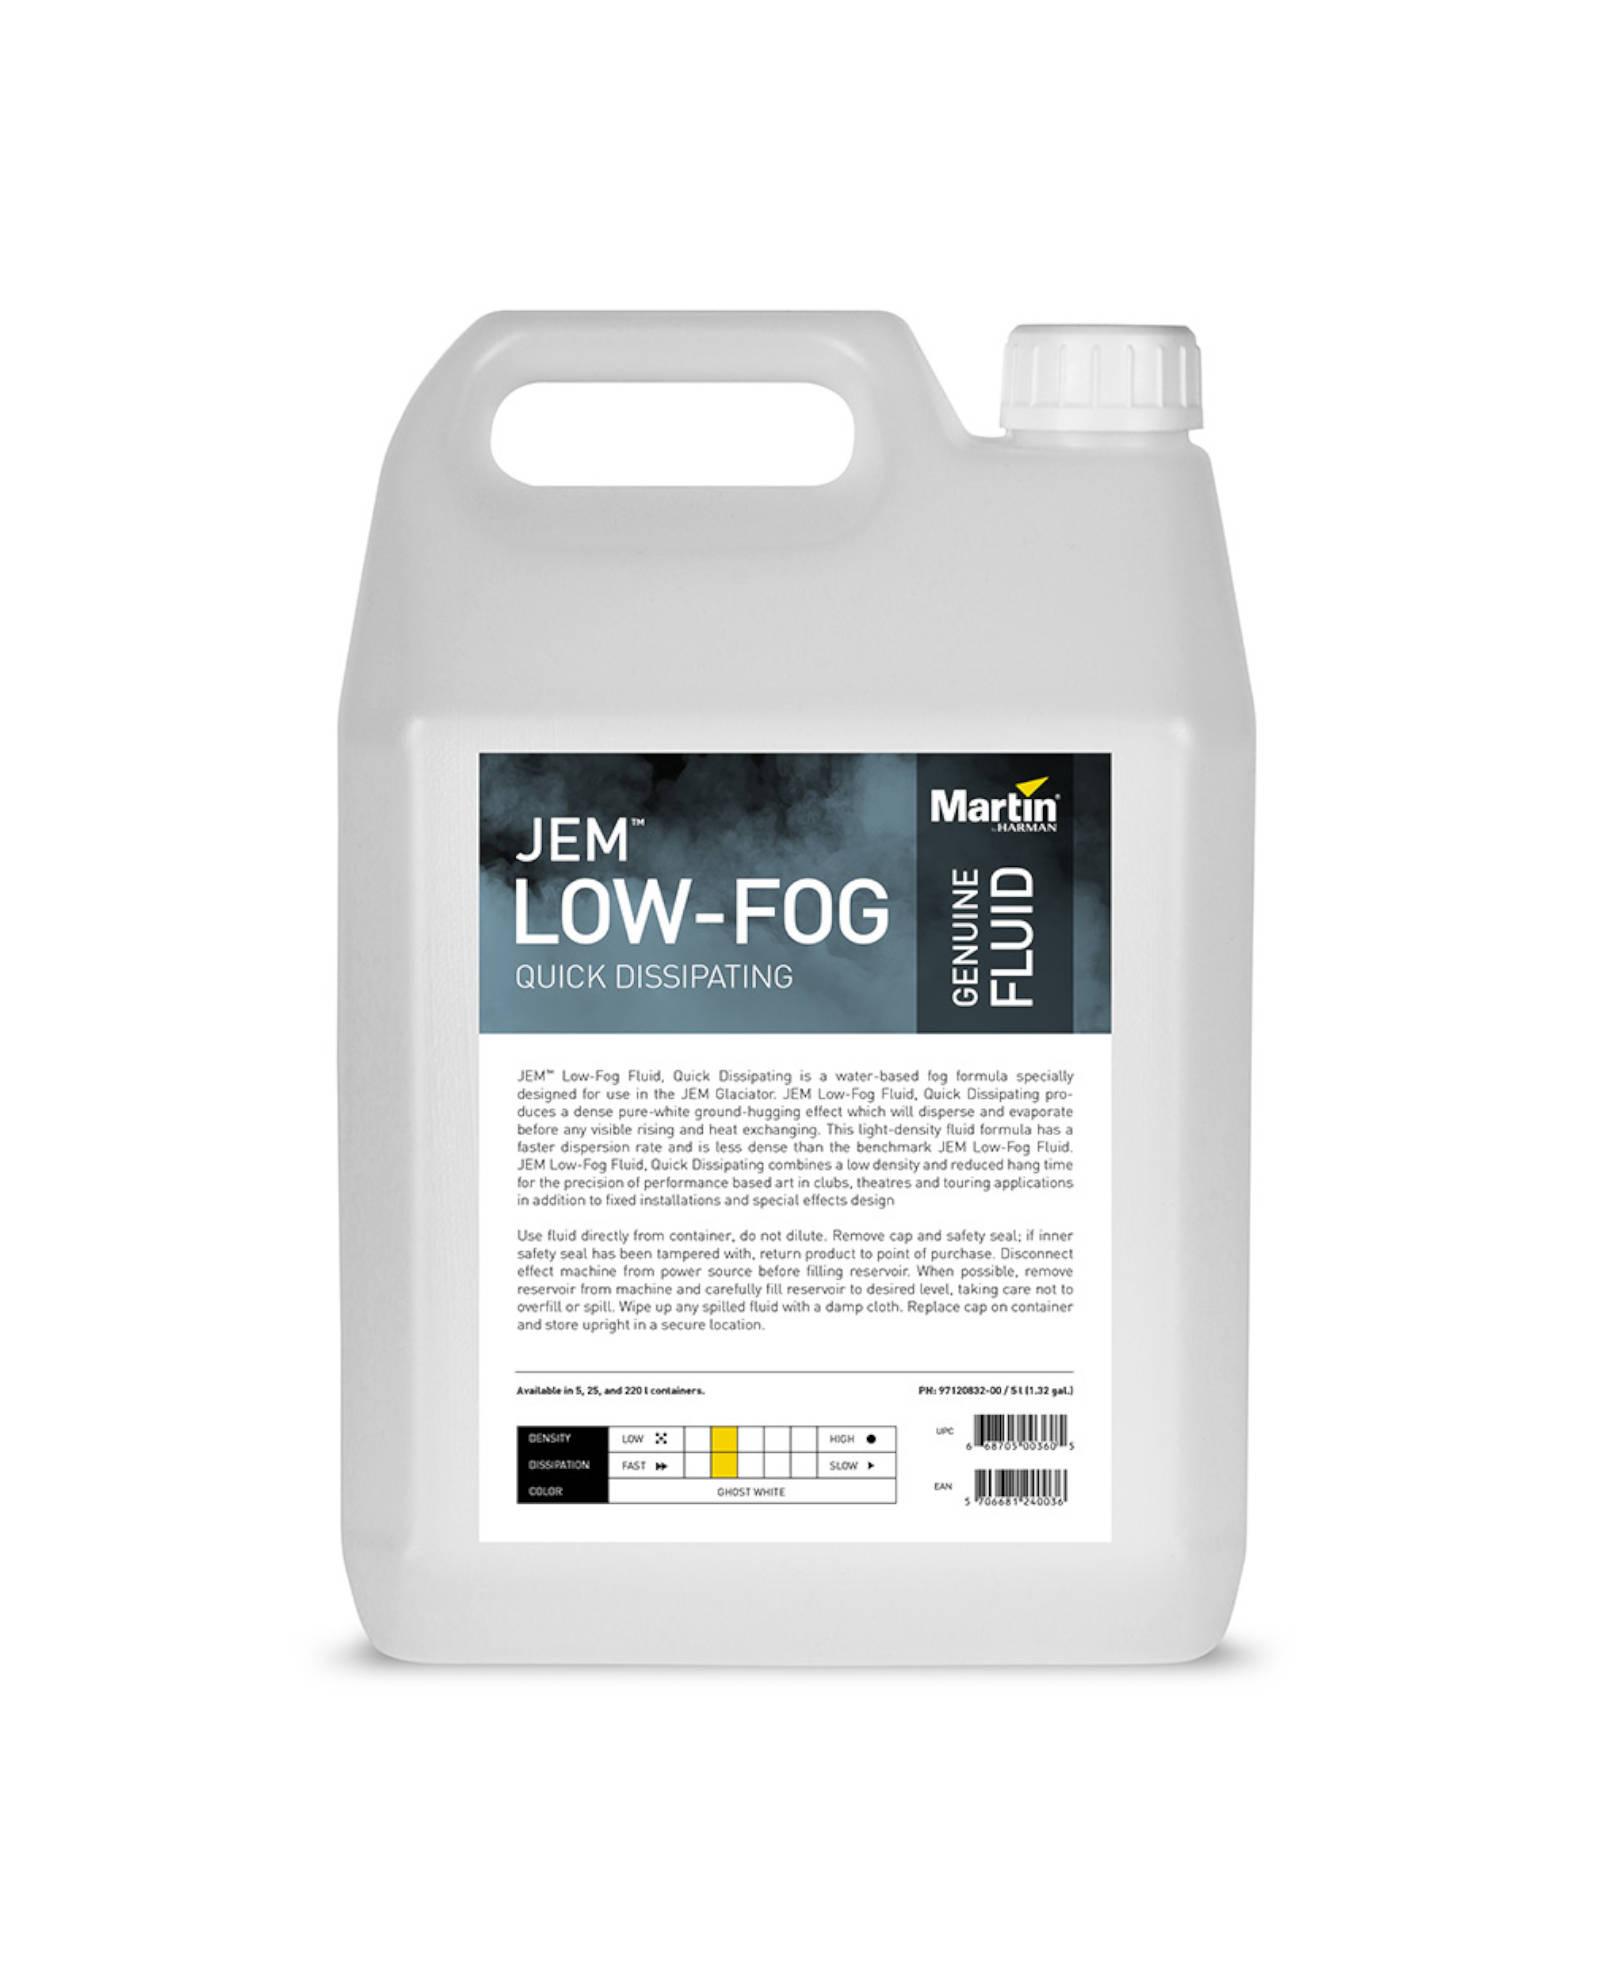 Jem Low Fog Fluid, Quick Dissipating